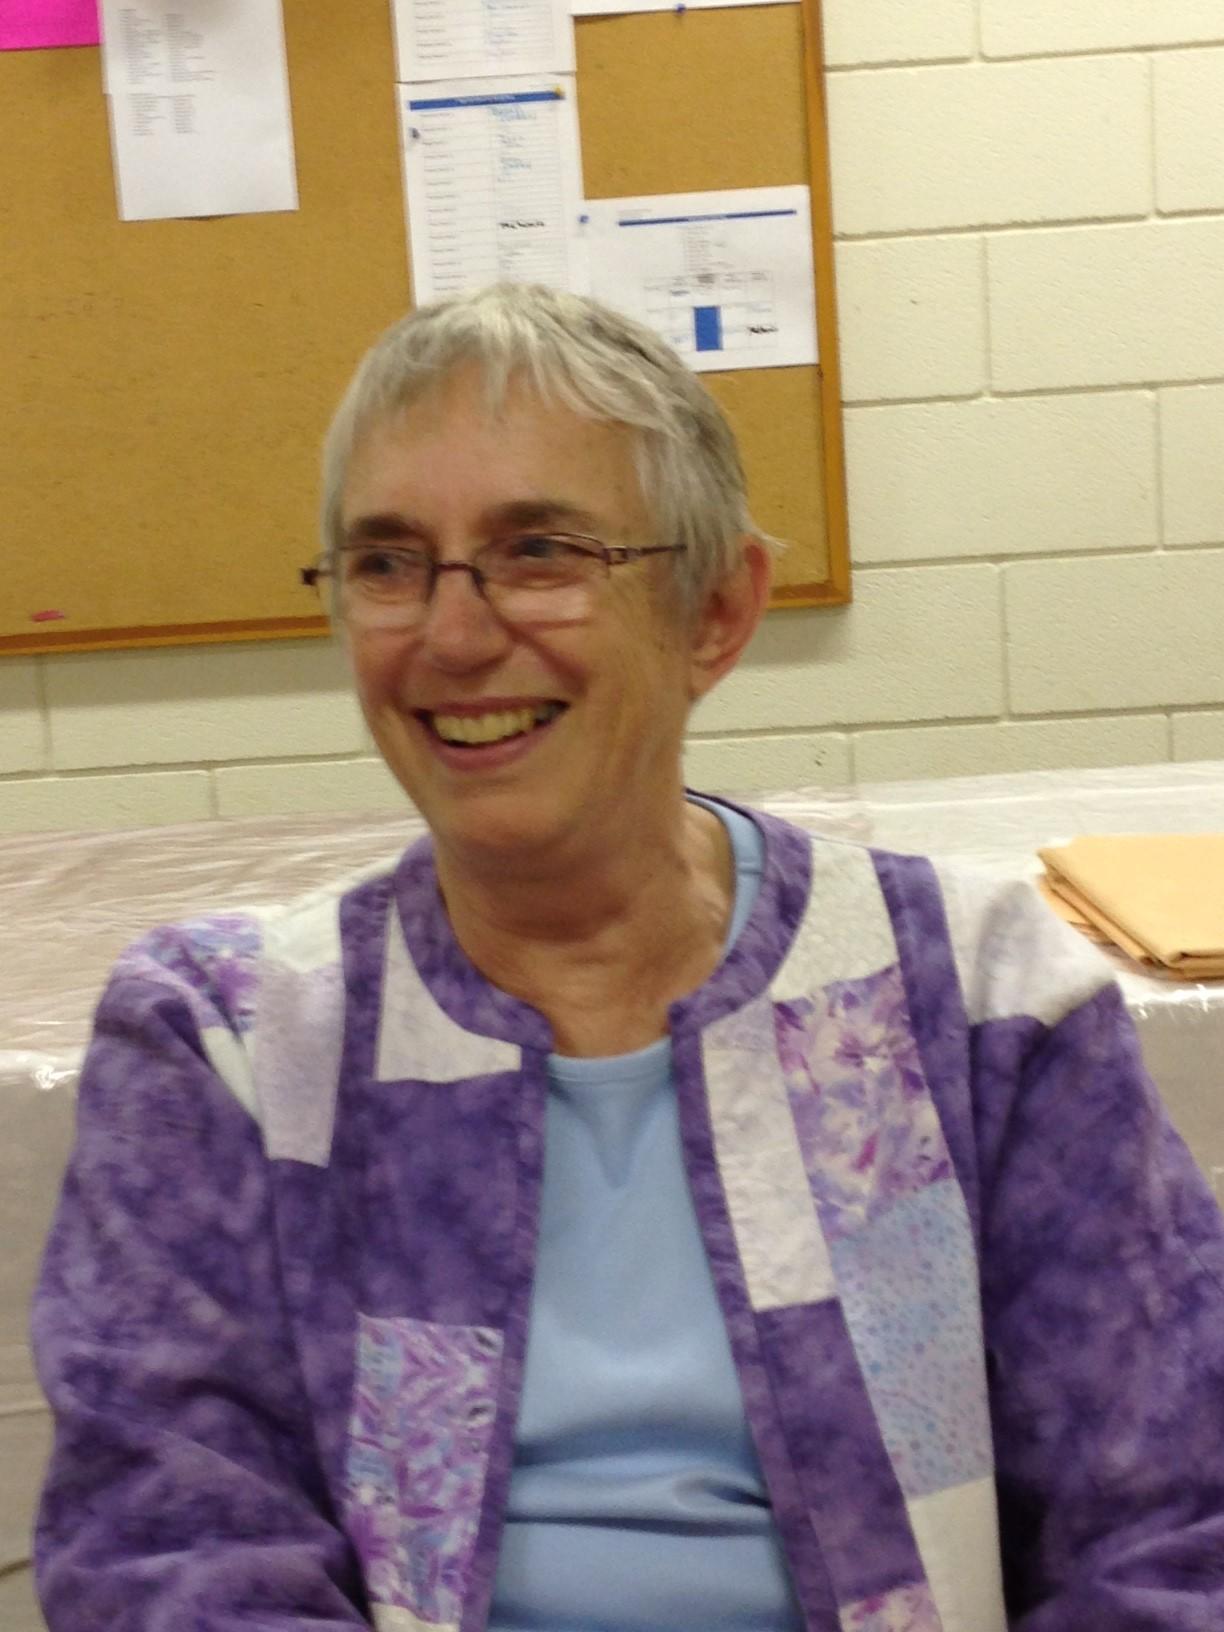 2015 Companion of the Centre: Irene Rainey